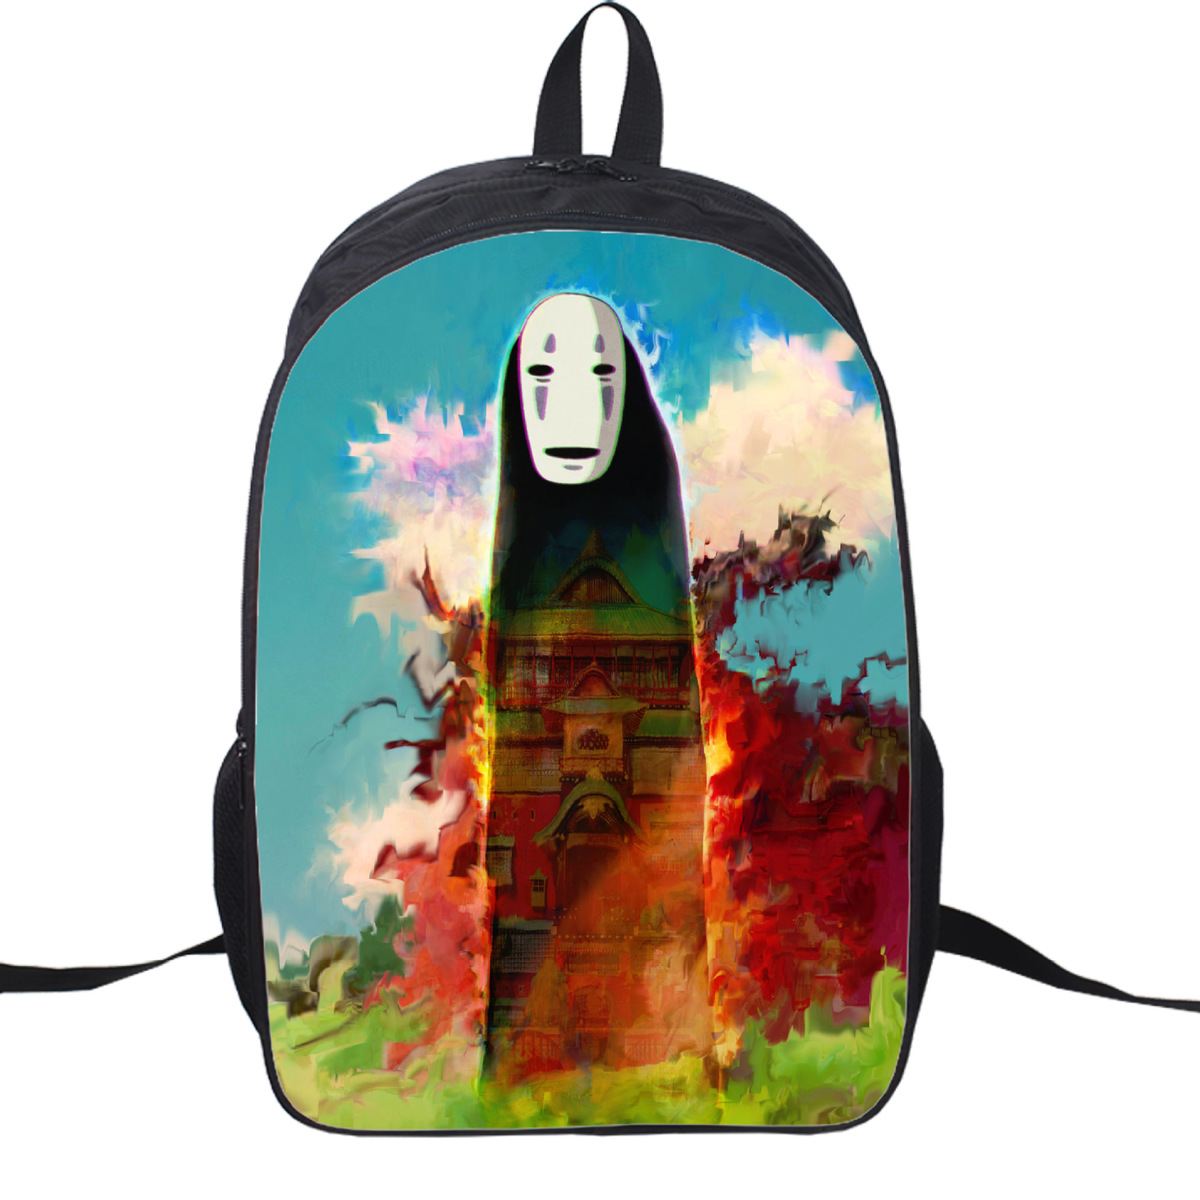 spirited backpack 8 styles